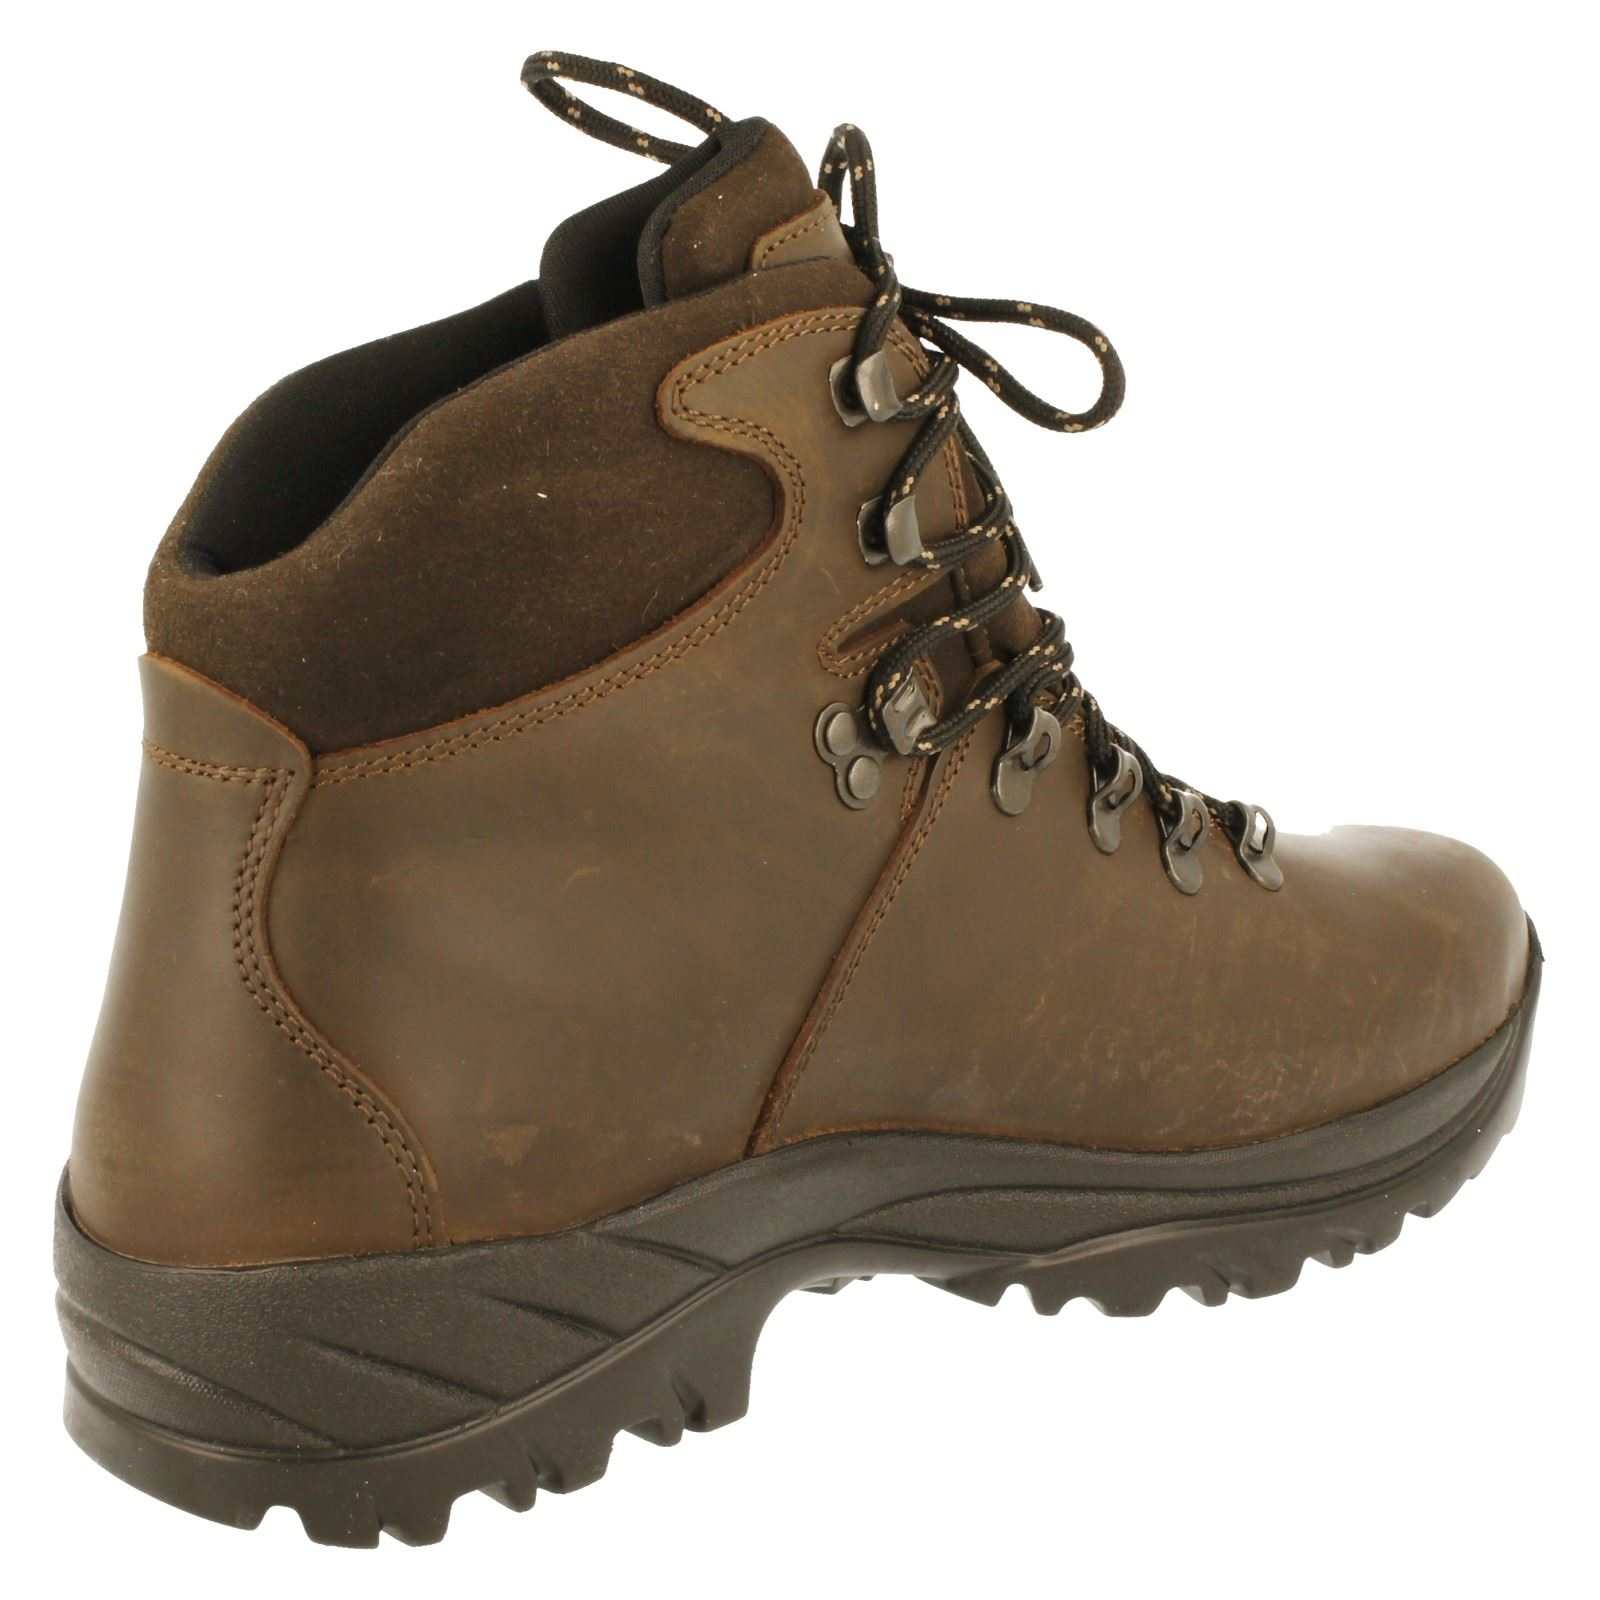 Mens Hi-Tec Waterprrof Walking Boots Style Style Style Ravine -W 28a01f